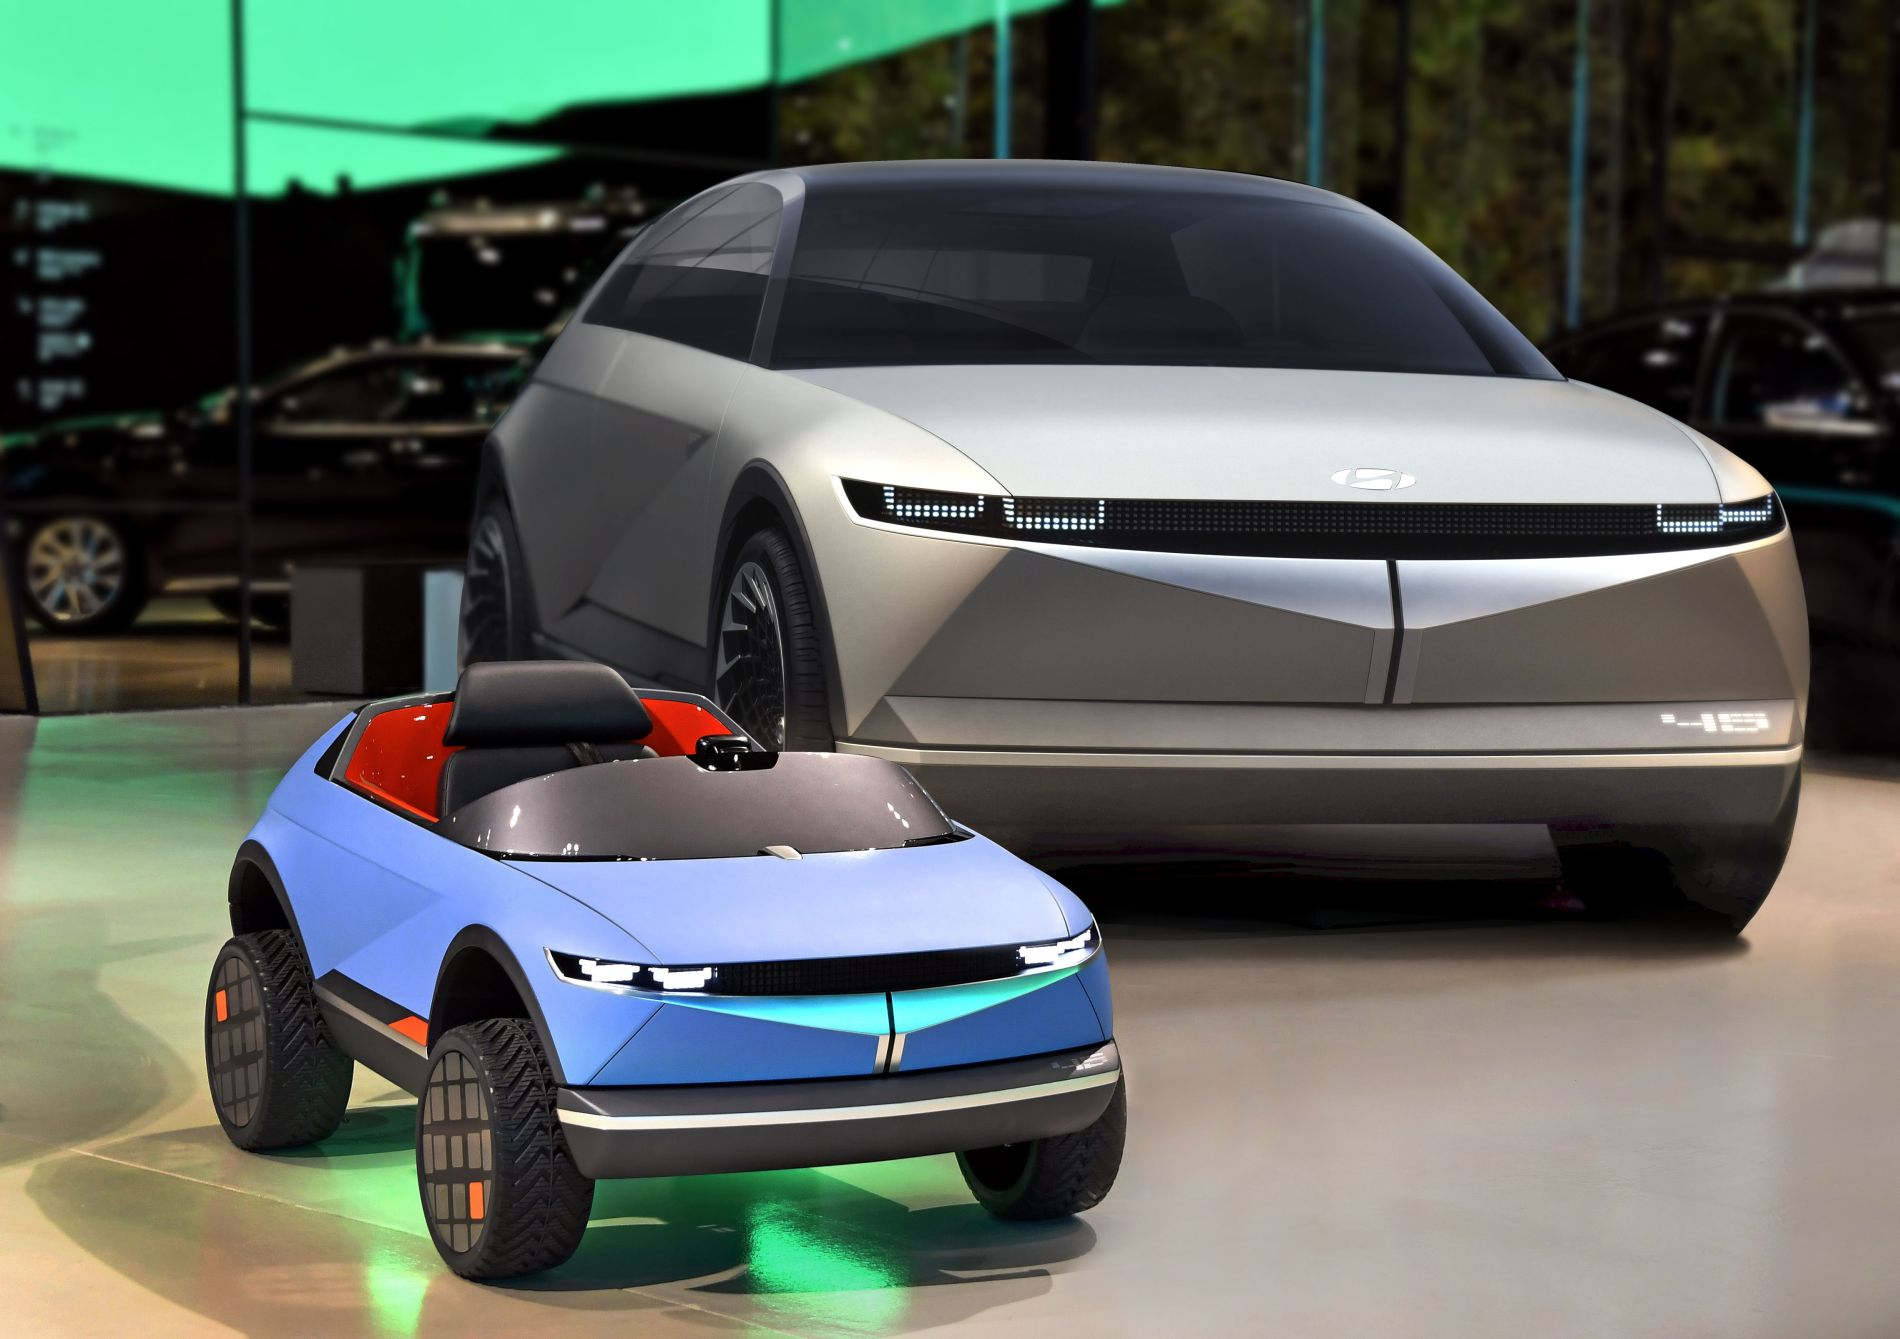 Hyundai prezintă un mini-vehicul electric